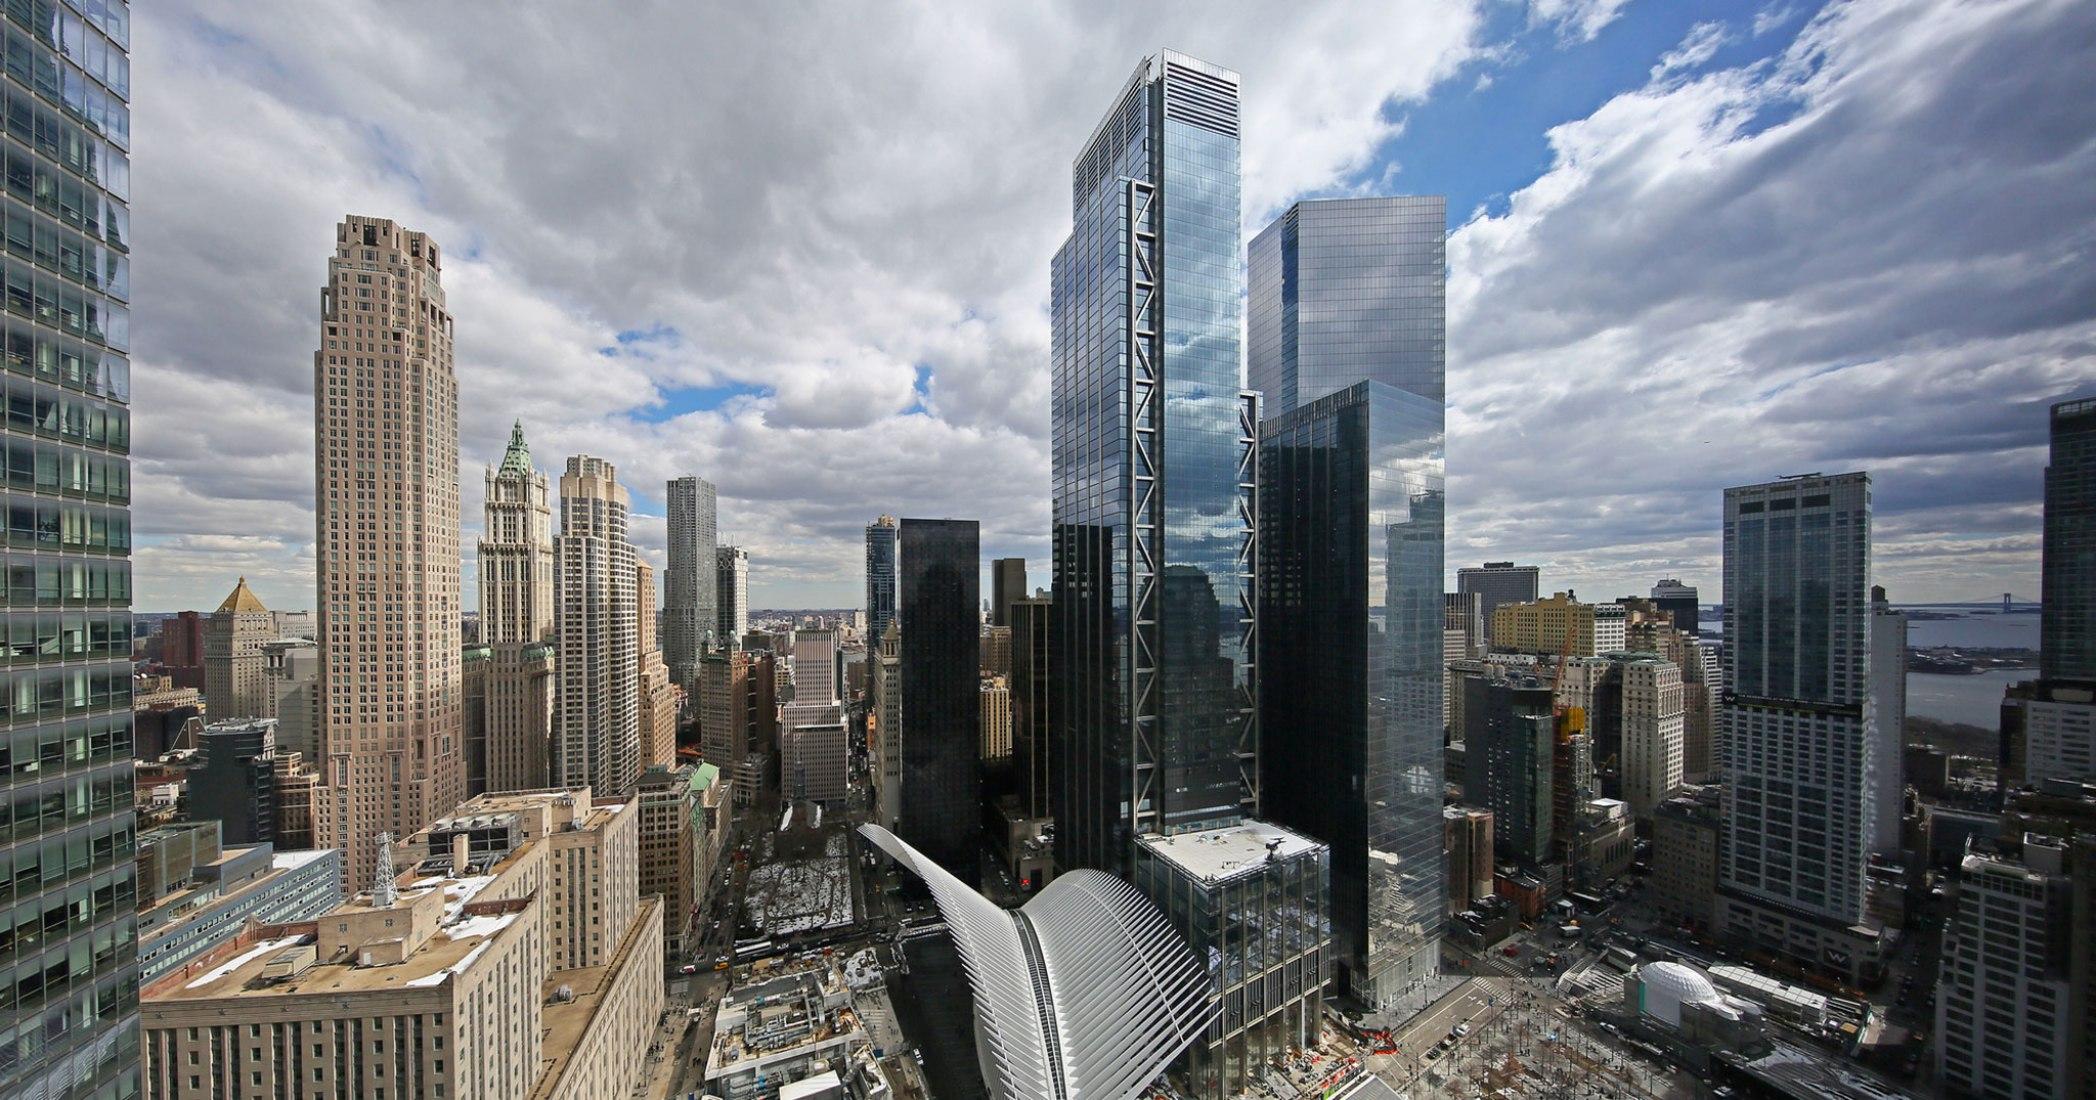 Apertura de 3 World Trade Center por Rogers Stirk Harbour + Partners. Imágen cortesía de World Trade Center